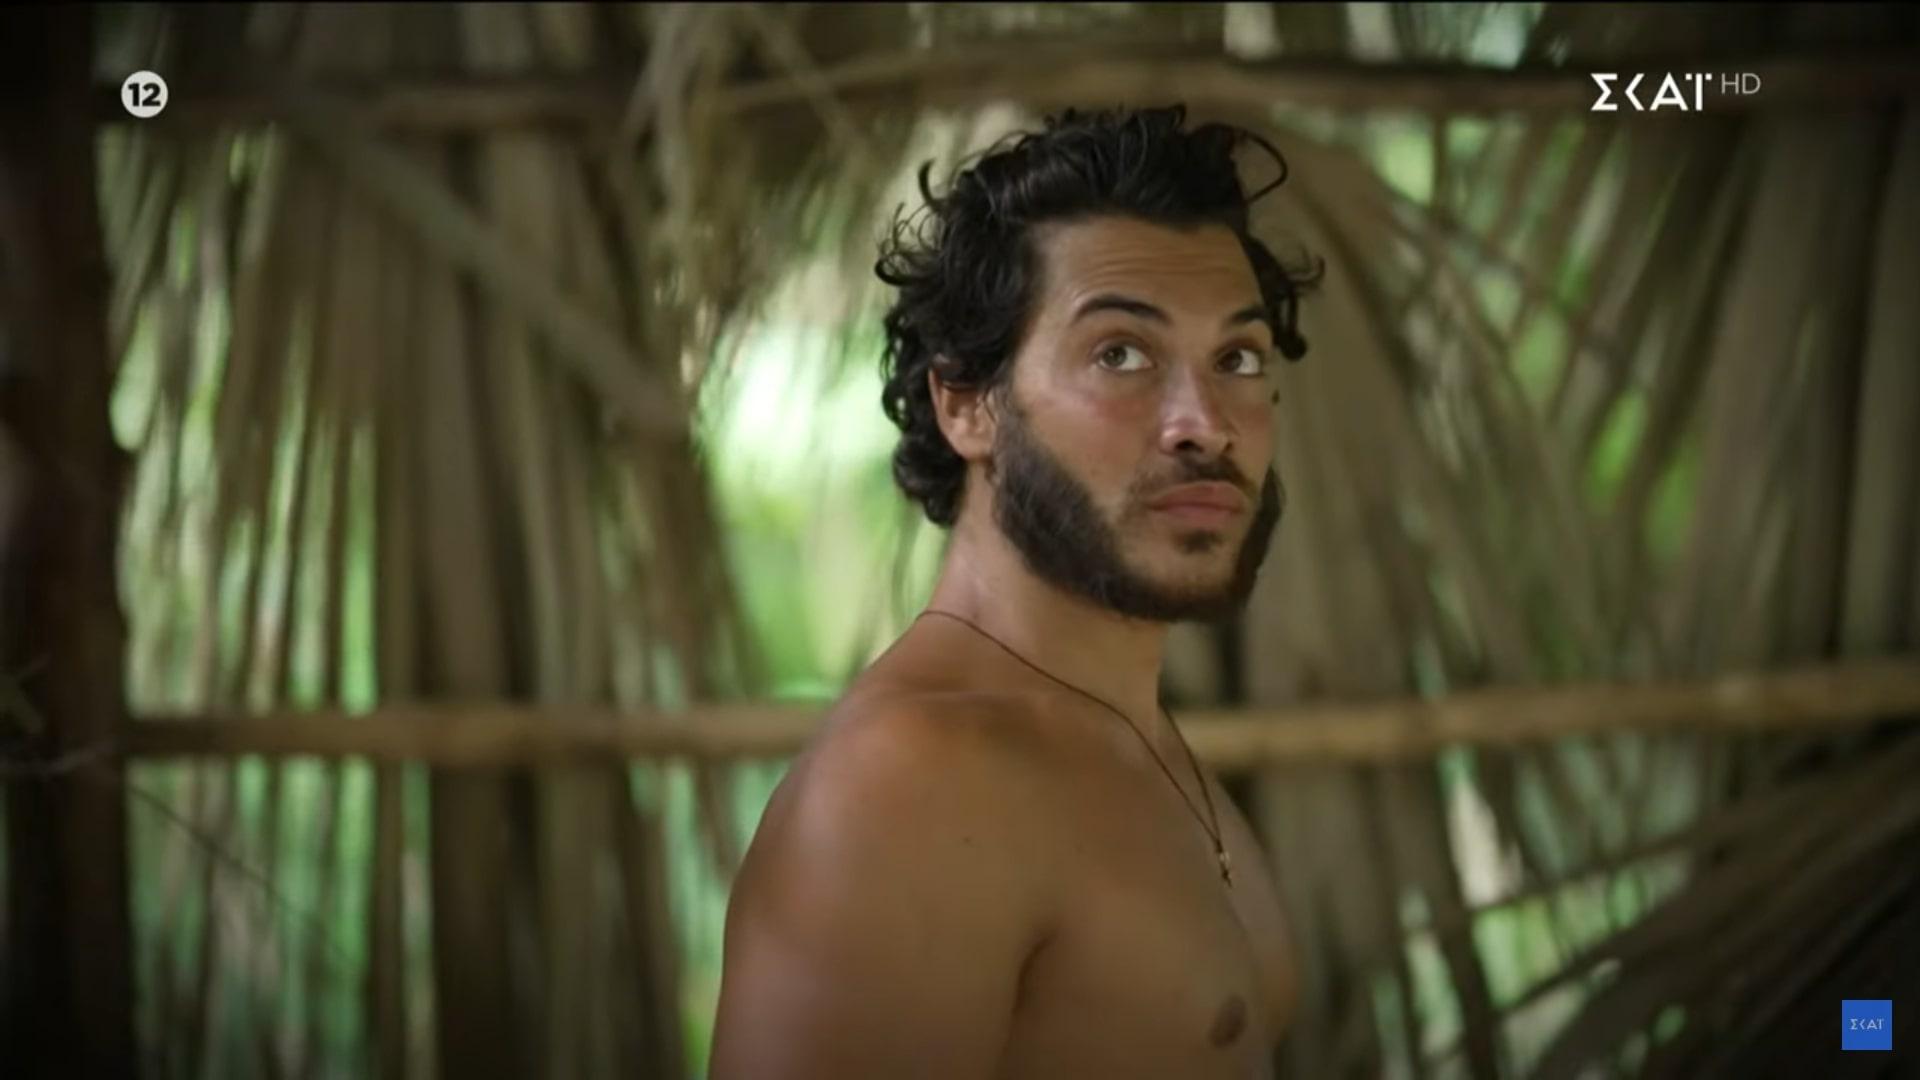 Survivor trailer 4/5: Φερέφωνο, δυνατές φιλίες και ασυλία για γερά νεύρα – Έξω από τα ρούχα του ο Ντάφυ (vid)